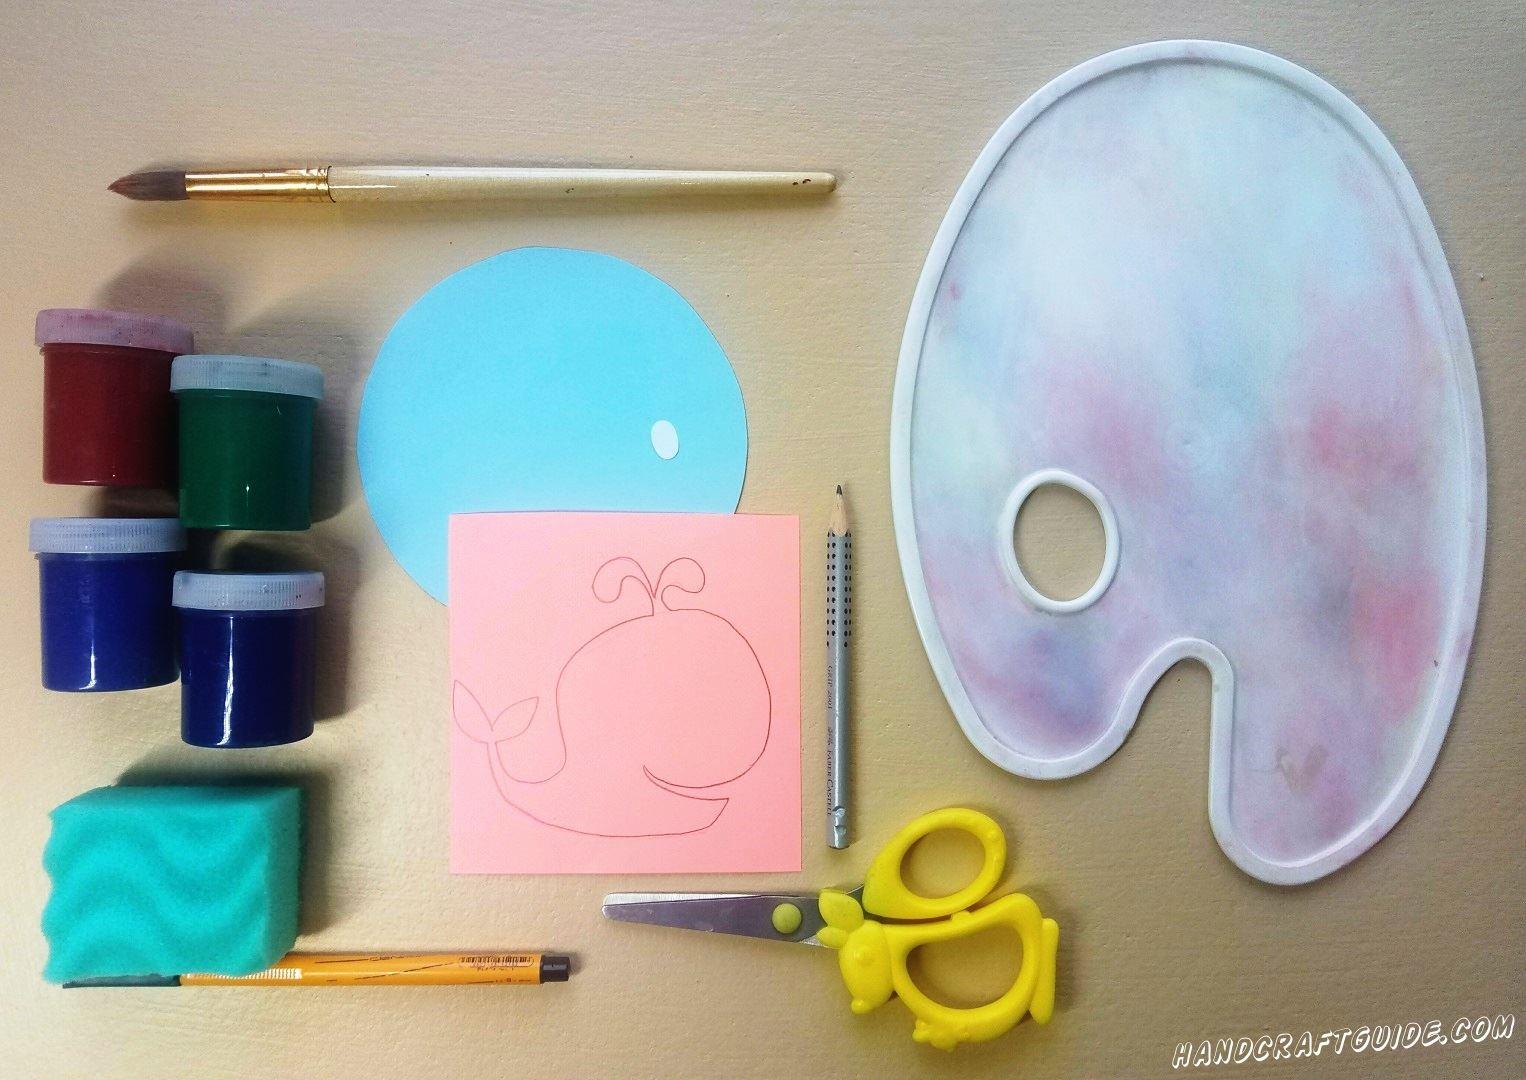 На розовом квадратике бумаги мы рисуем кита с фонтанчиком, как показано на фото